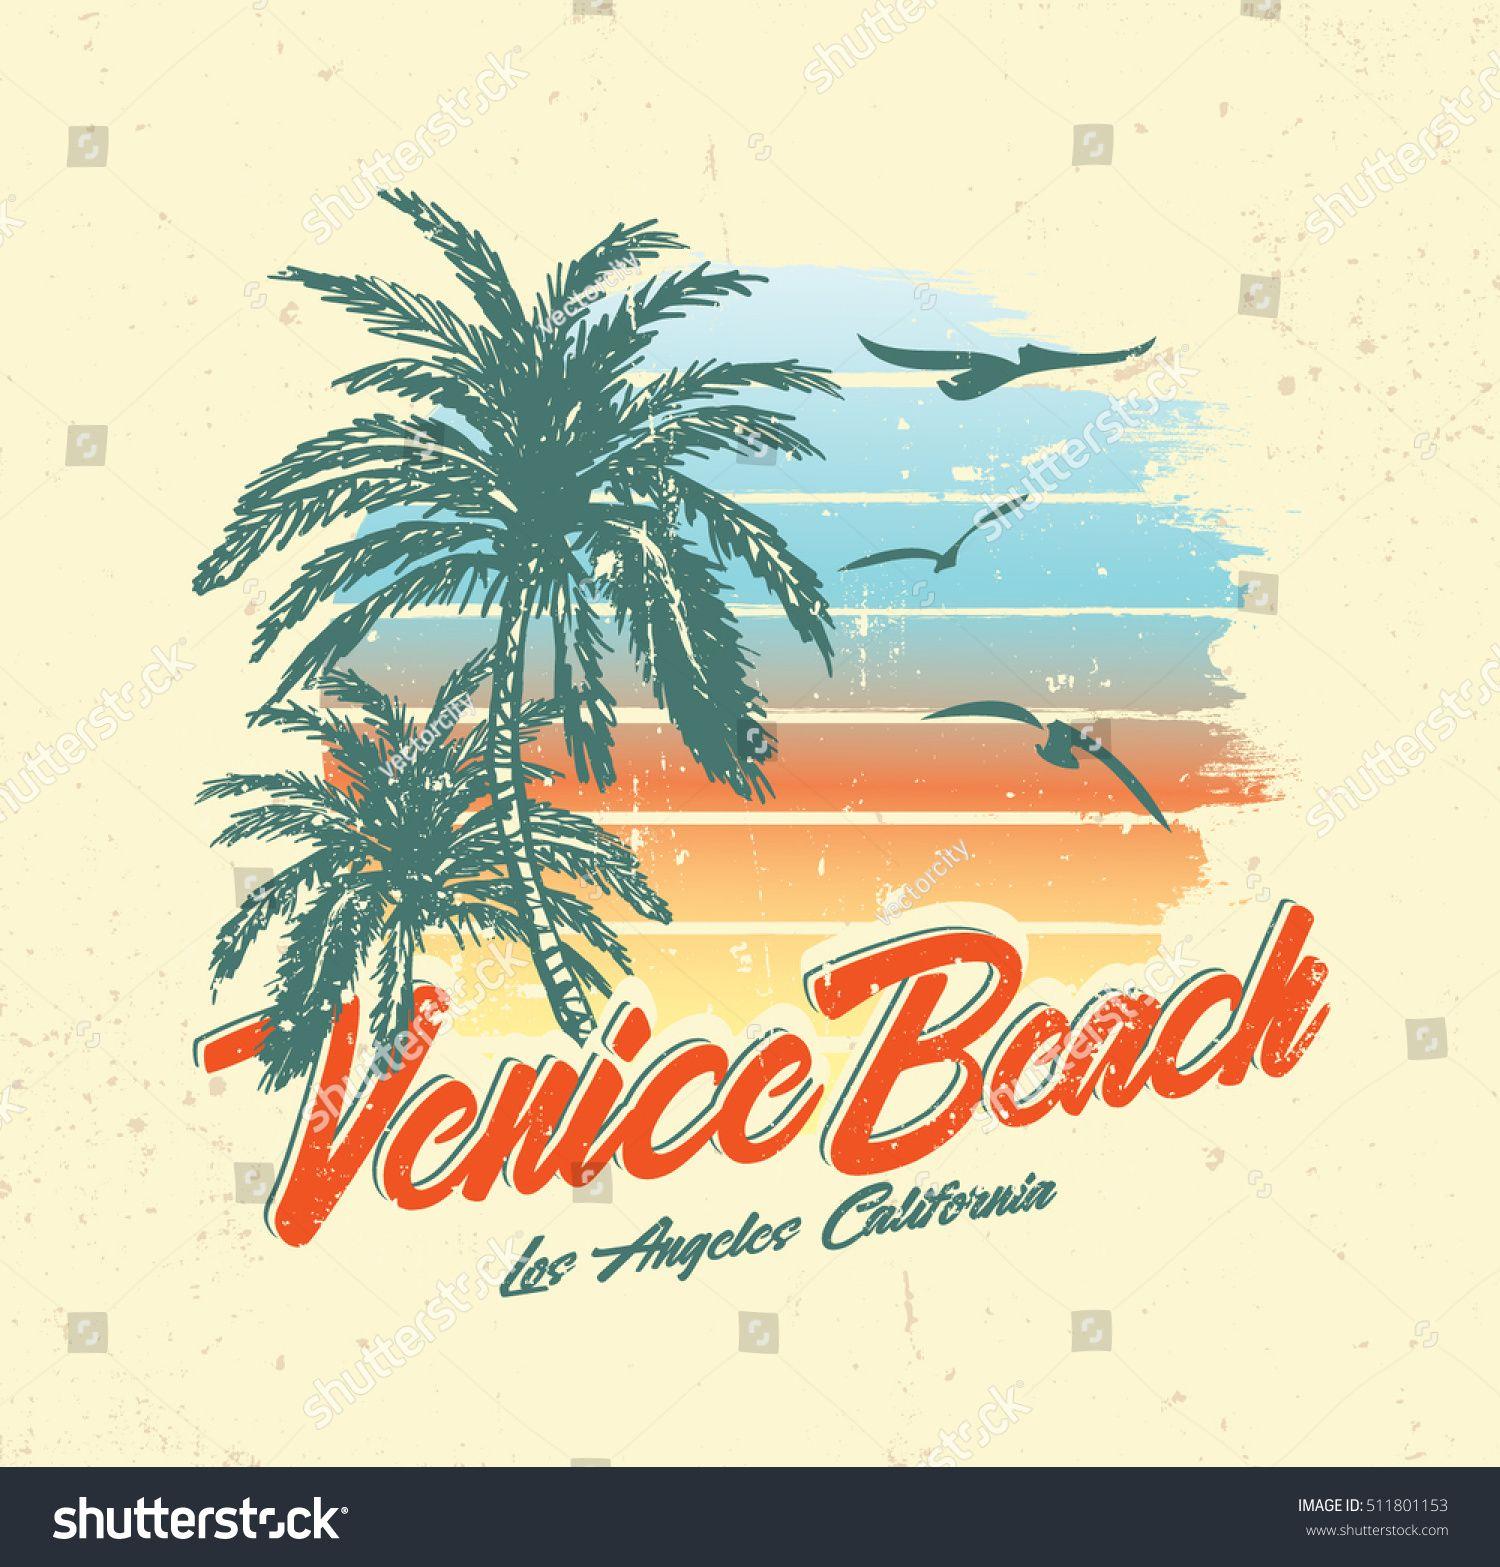 Tropical Sunset Surf And Beach Vintage Beach Print Tee Graphic Design Beach Illustration Sunset Surf Vintage Beach